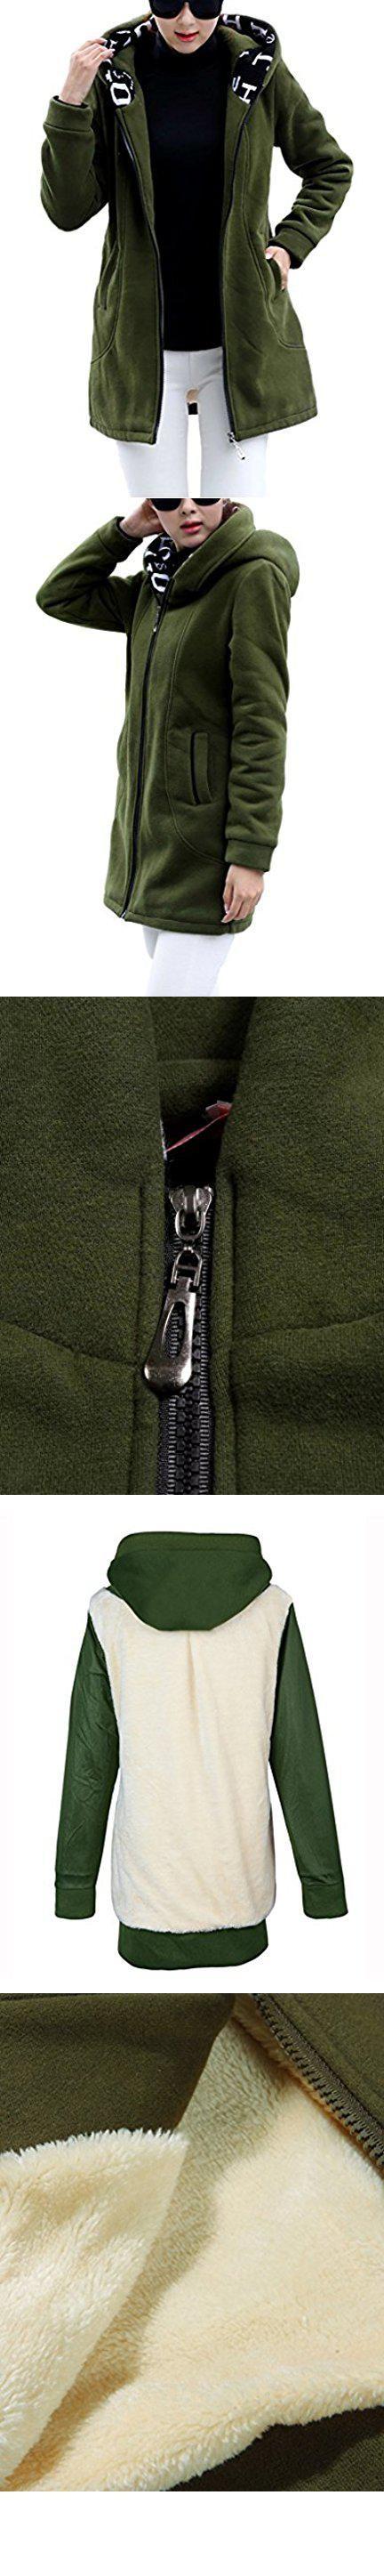 Zanlice womenus thick fleece zip up hoodie thermal jacket coat small